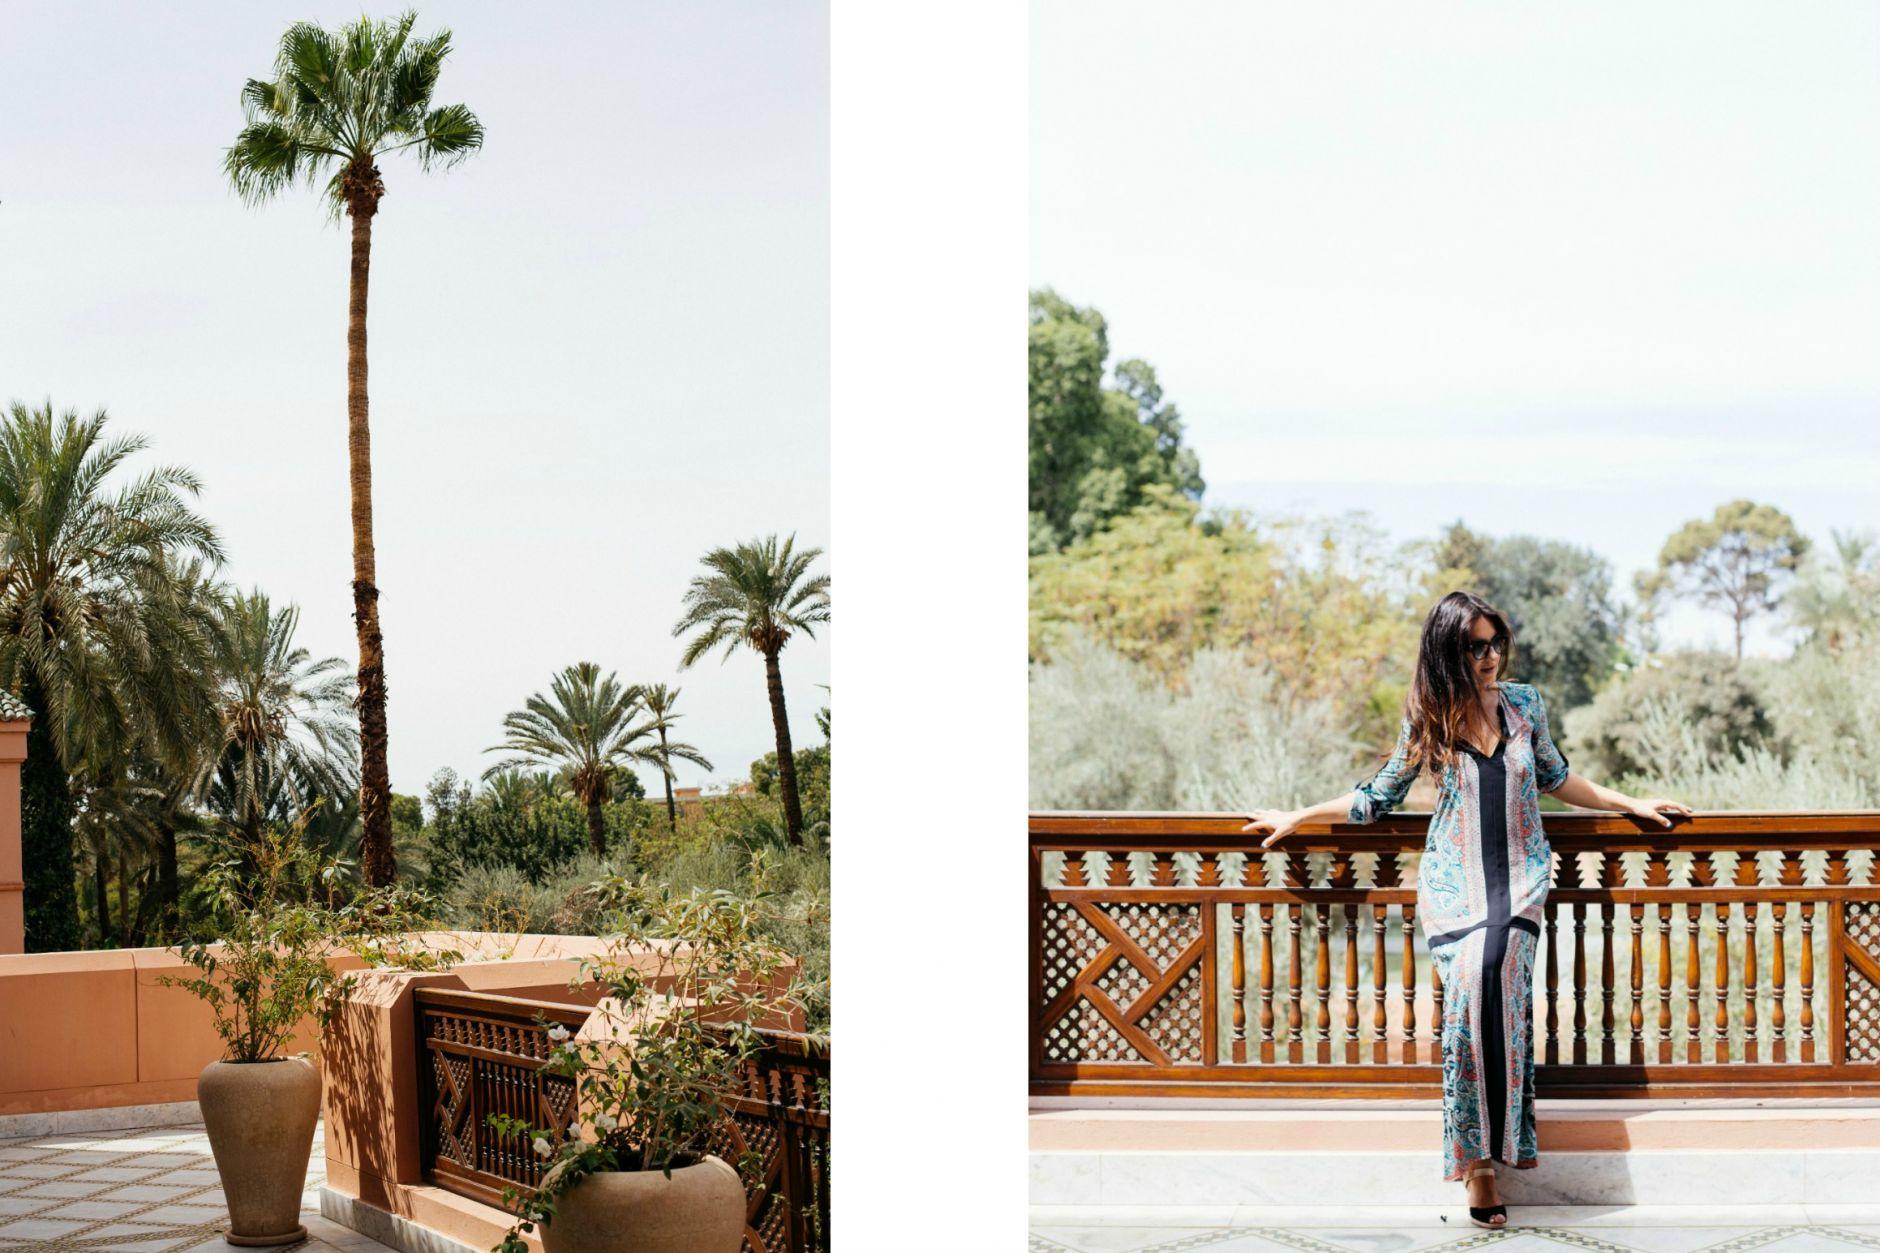 royal-mansour-hotel-luxury-marrakesch-marrakesh-morocco-edisa-shahini-disicouture-blog-duo-04